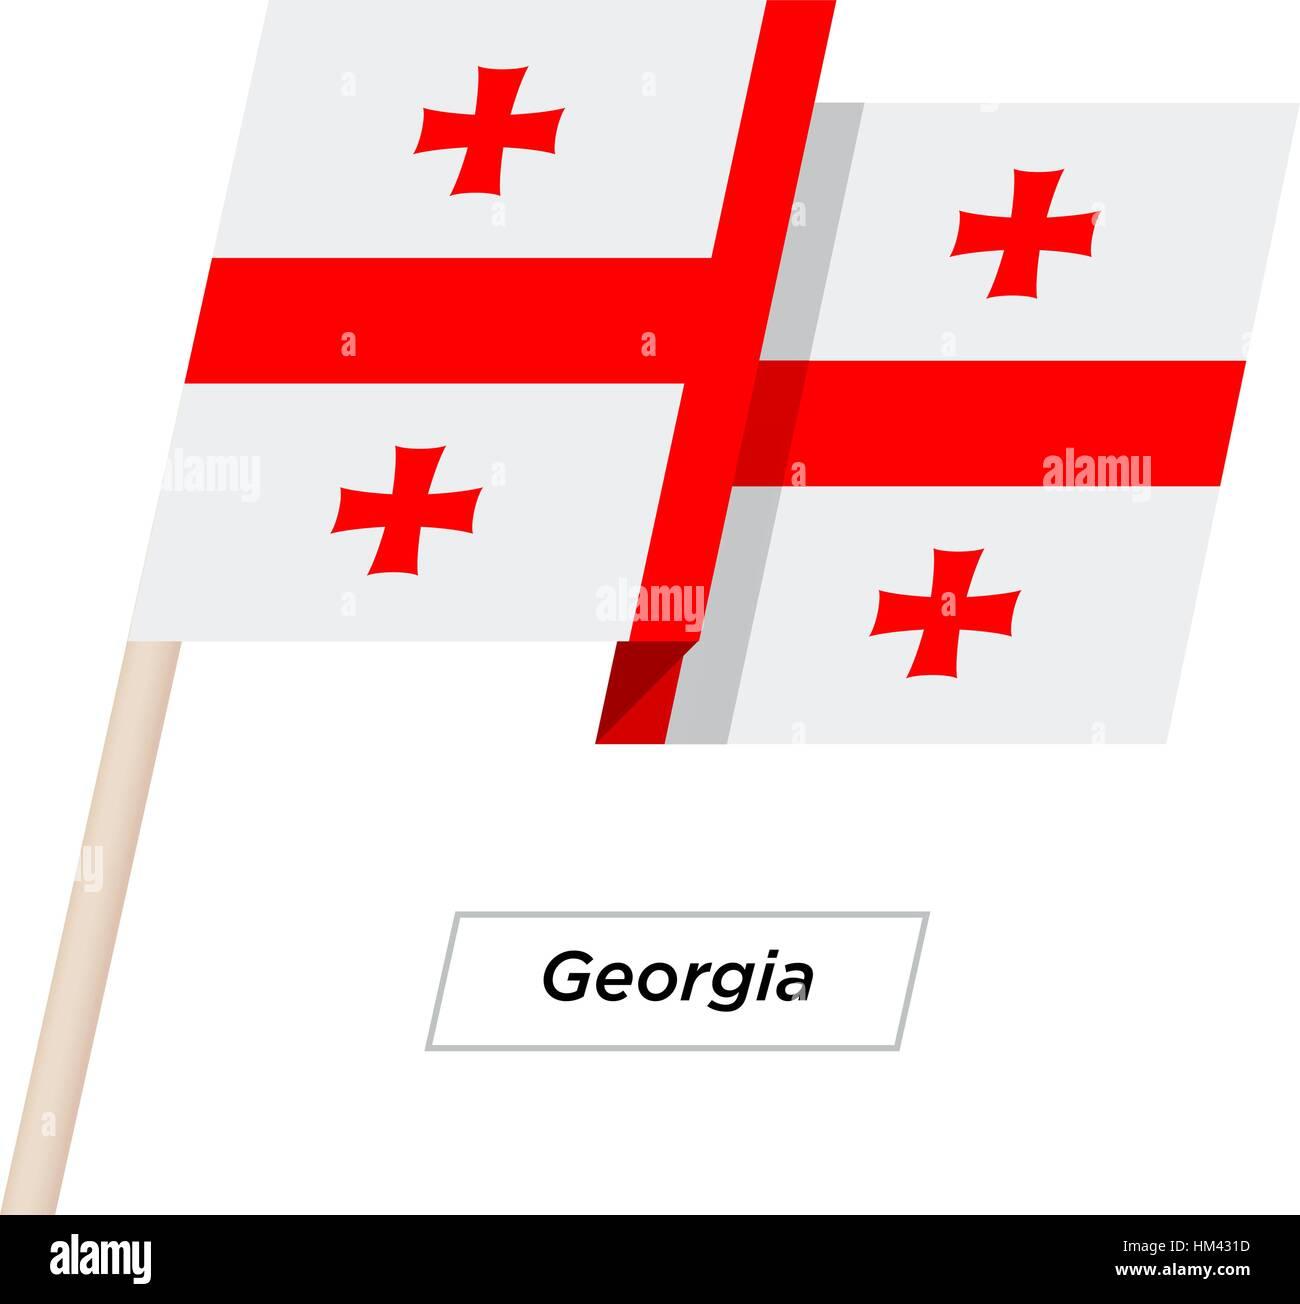 Georgia Ribbon Waving Flag Isolated on White. Vector Illustration. - Stock Image